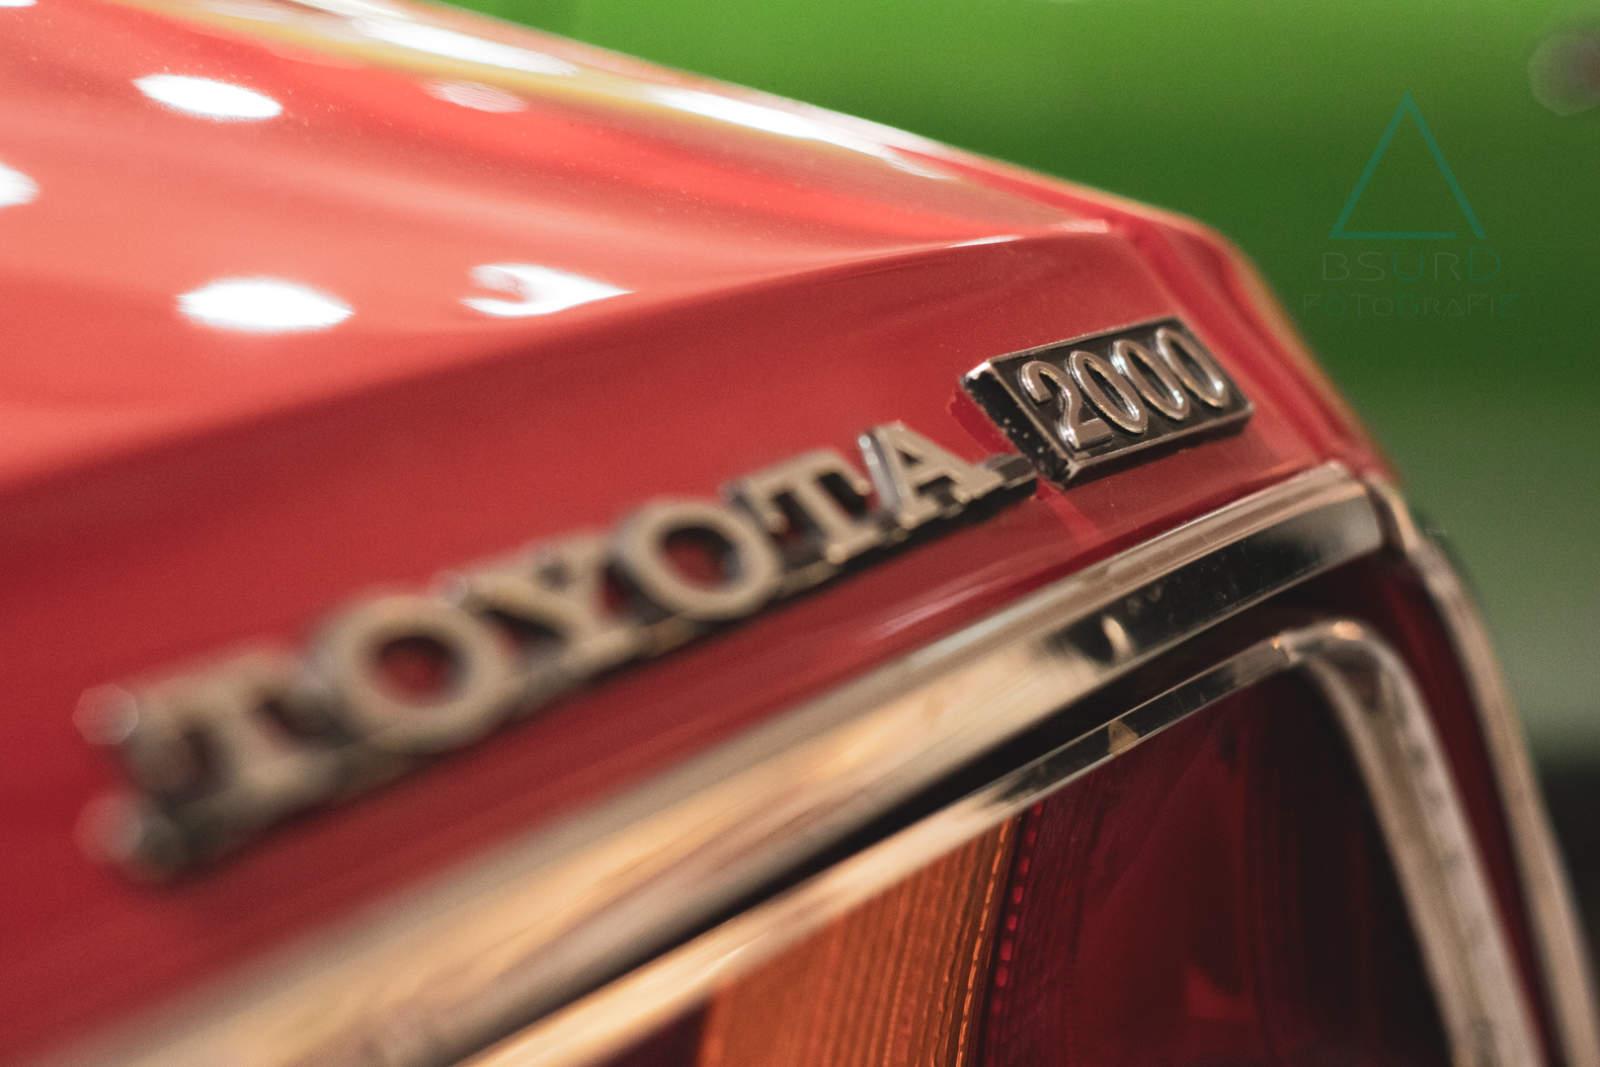 2019-01-05-Toyota-Collection-Koeln - DSC01839-edit-125.jpg